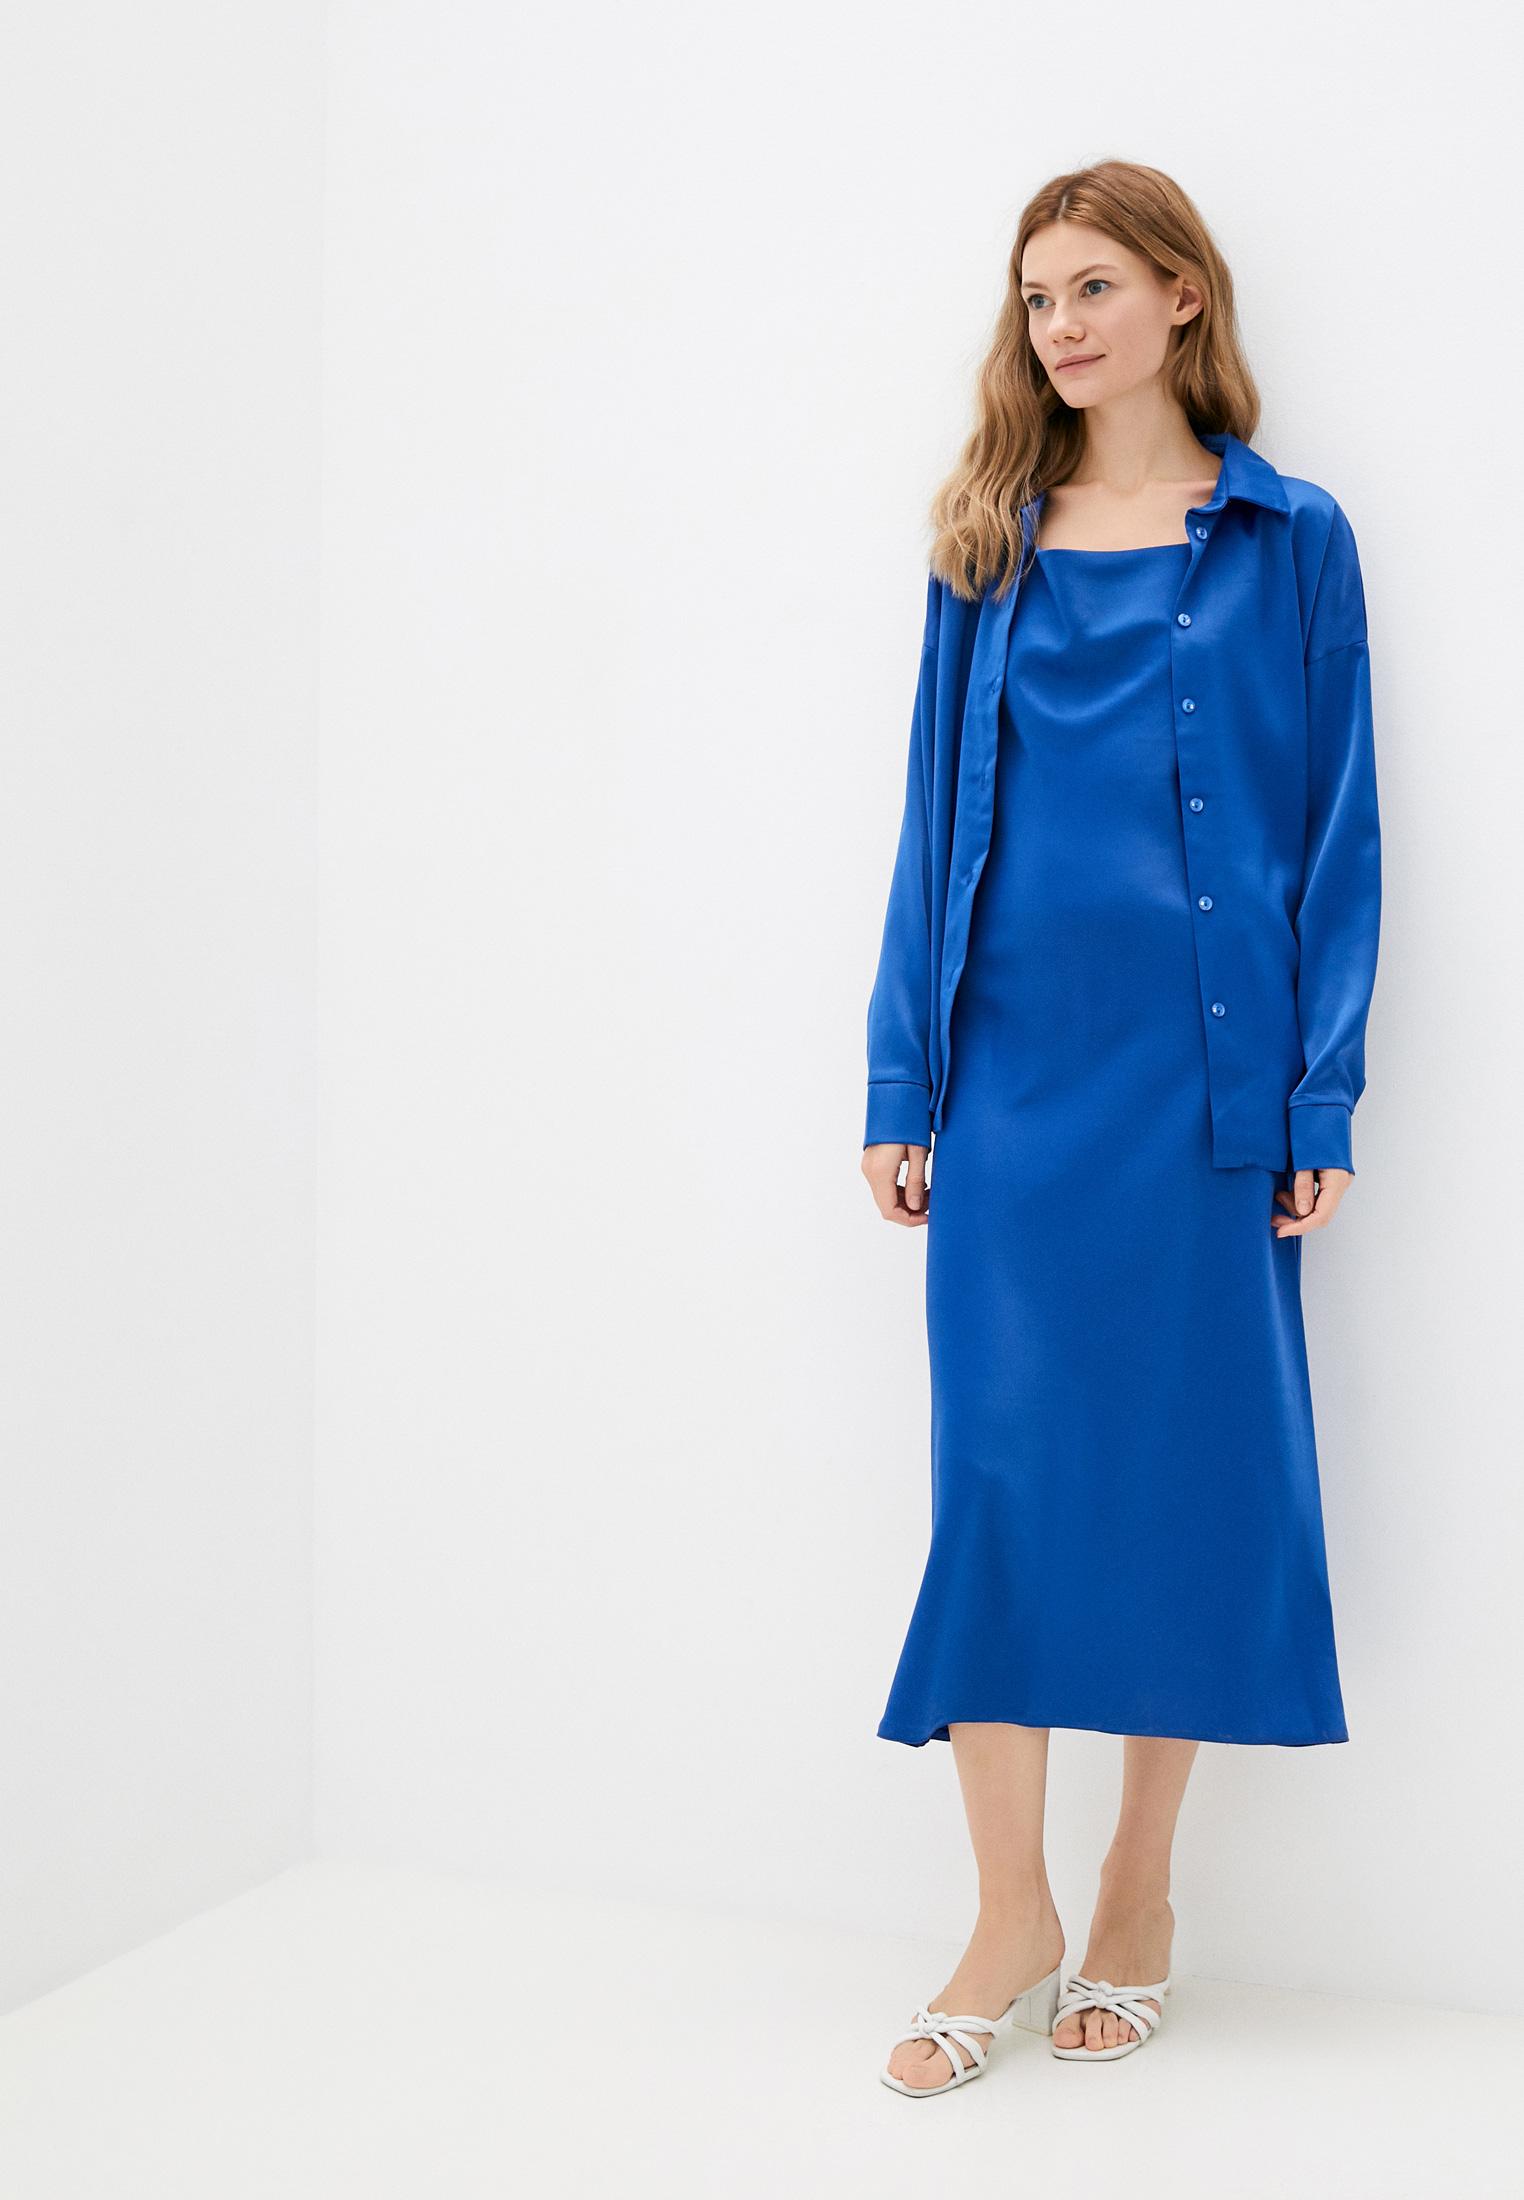 Костюм с юбкой Rainrain Платье и блуза Rainrain